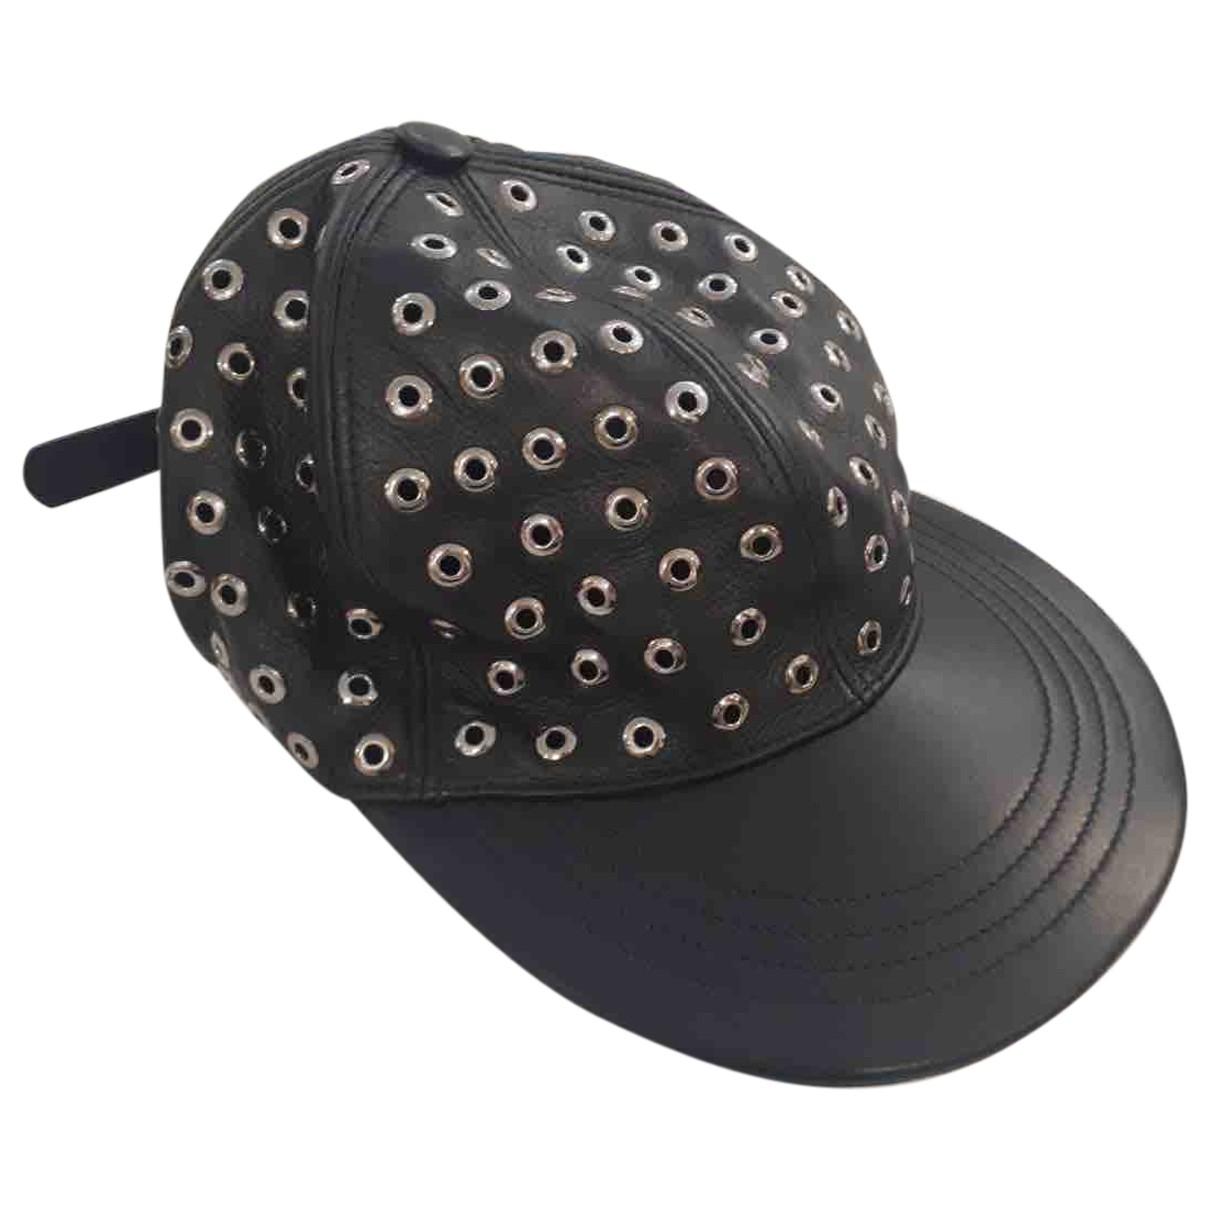 Red Valentino Garavani \N Black Leather hat for Women M International